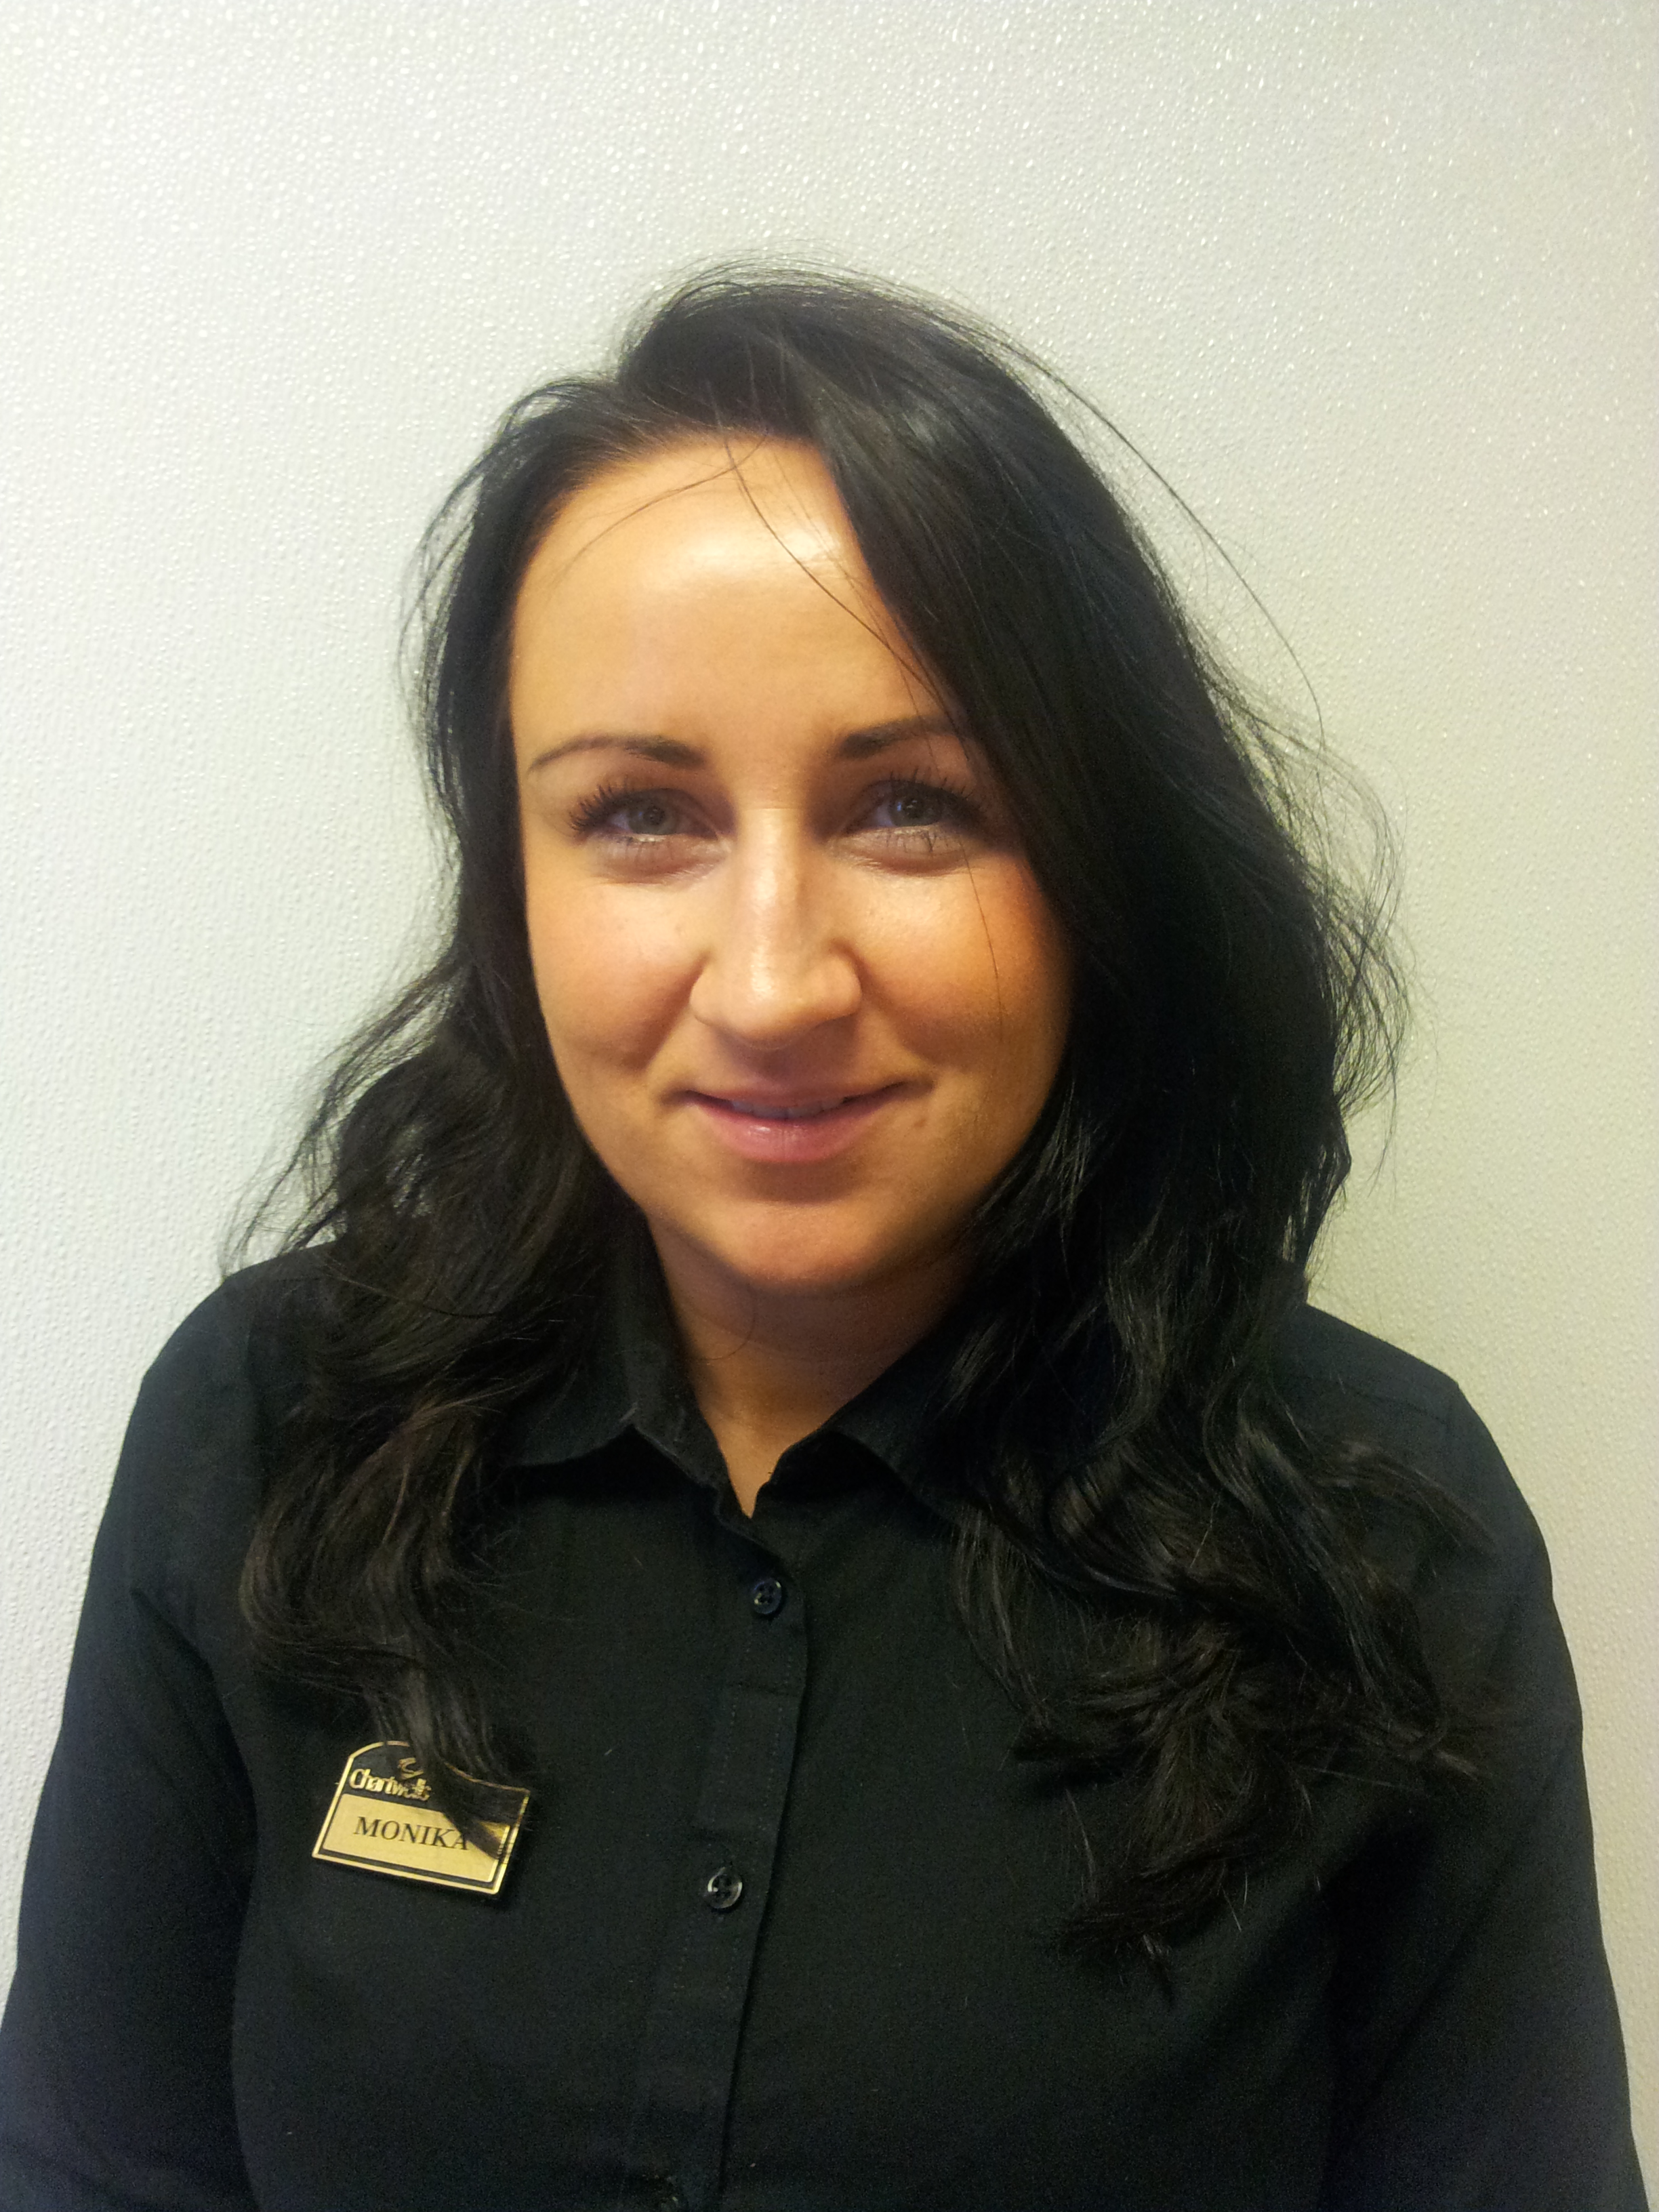 Monika Wojciechowski - Food Service Director, Lakeshore